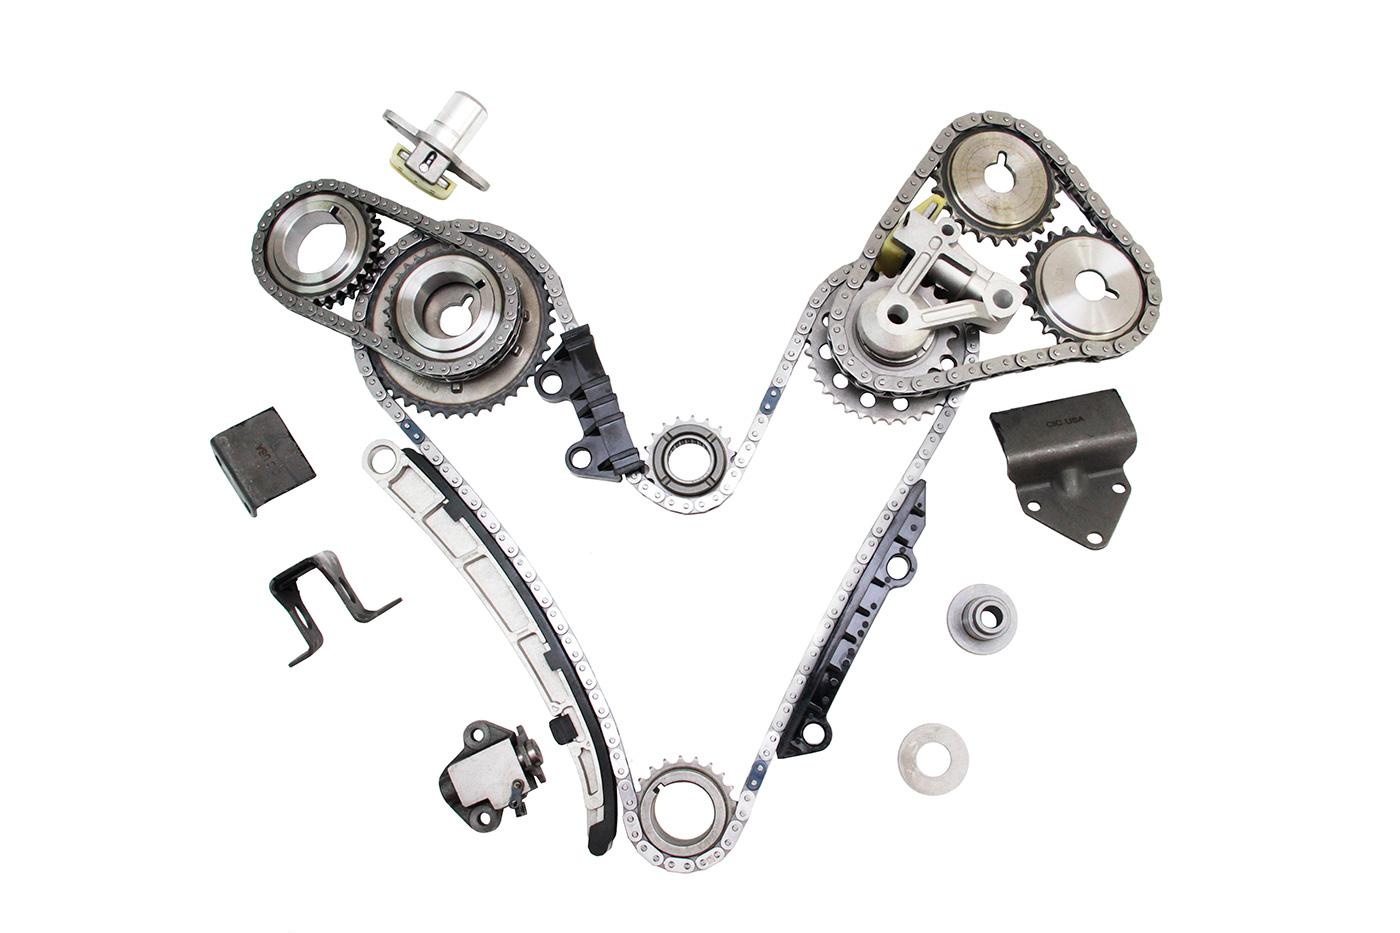 Timing Chain Kit Suzuki Grand Vitara Dohc 07-09 / H27A